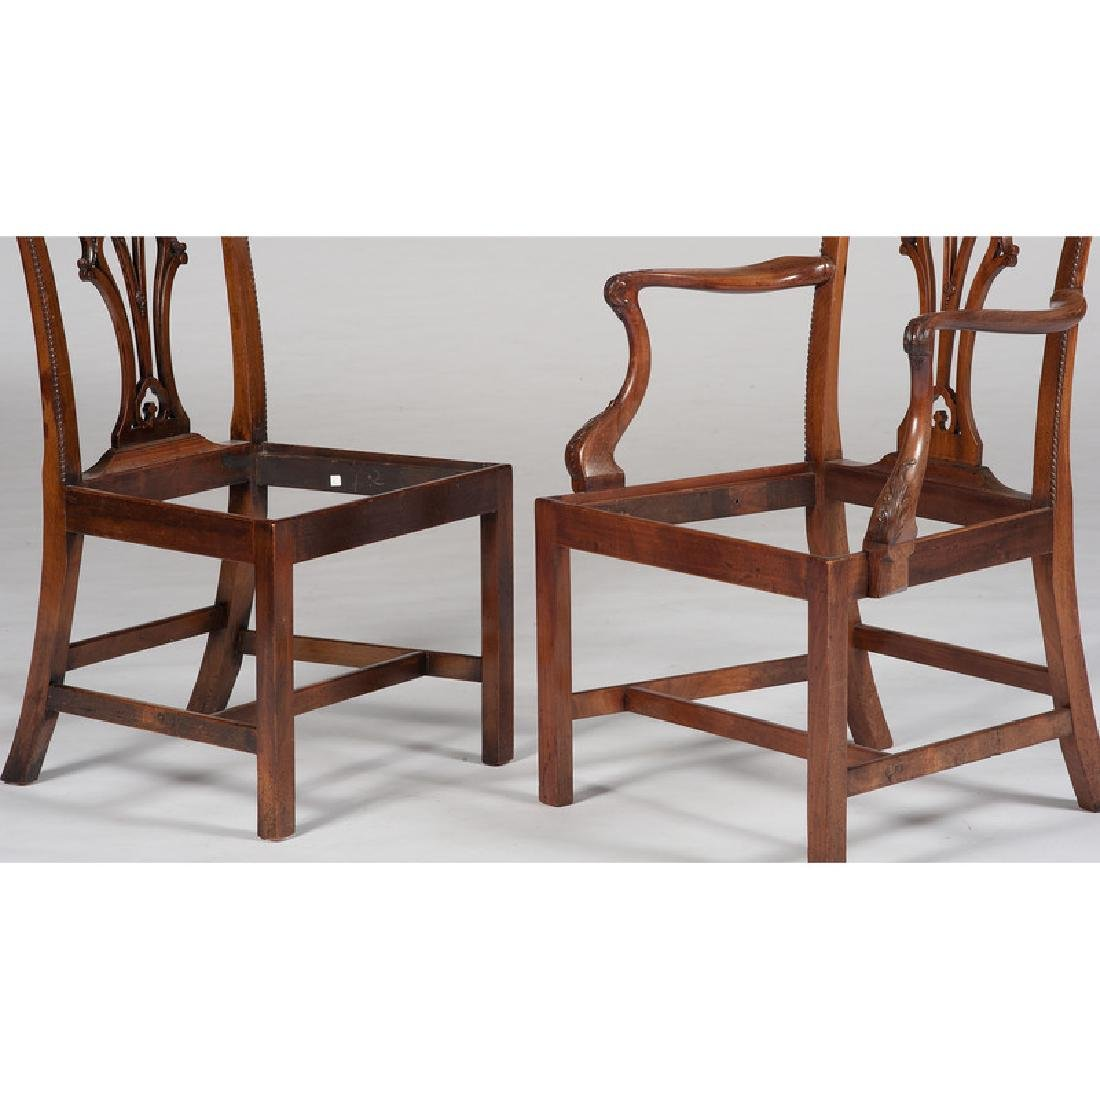 Twelve George III Chippendale Chairs - 3